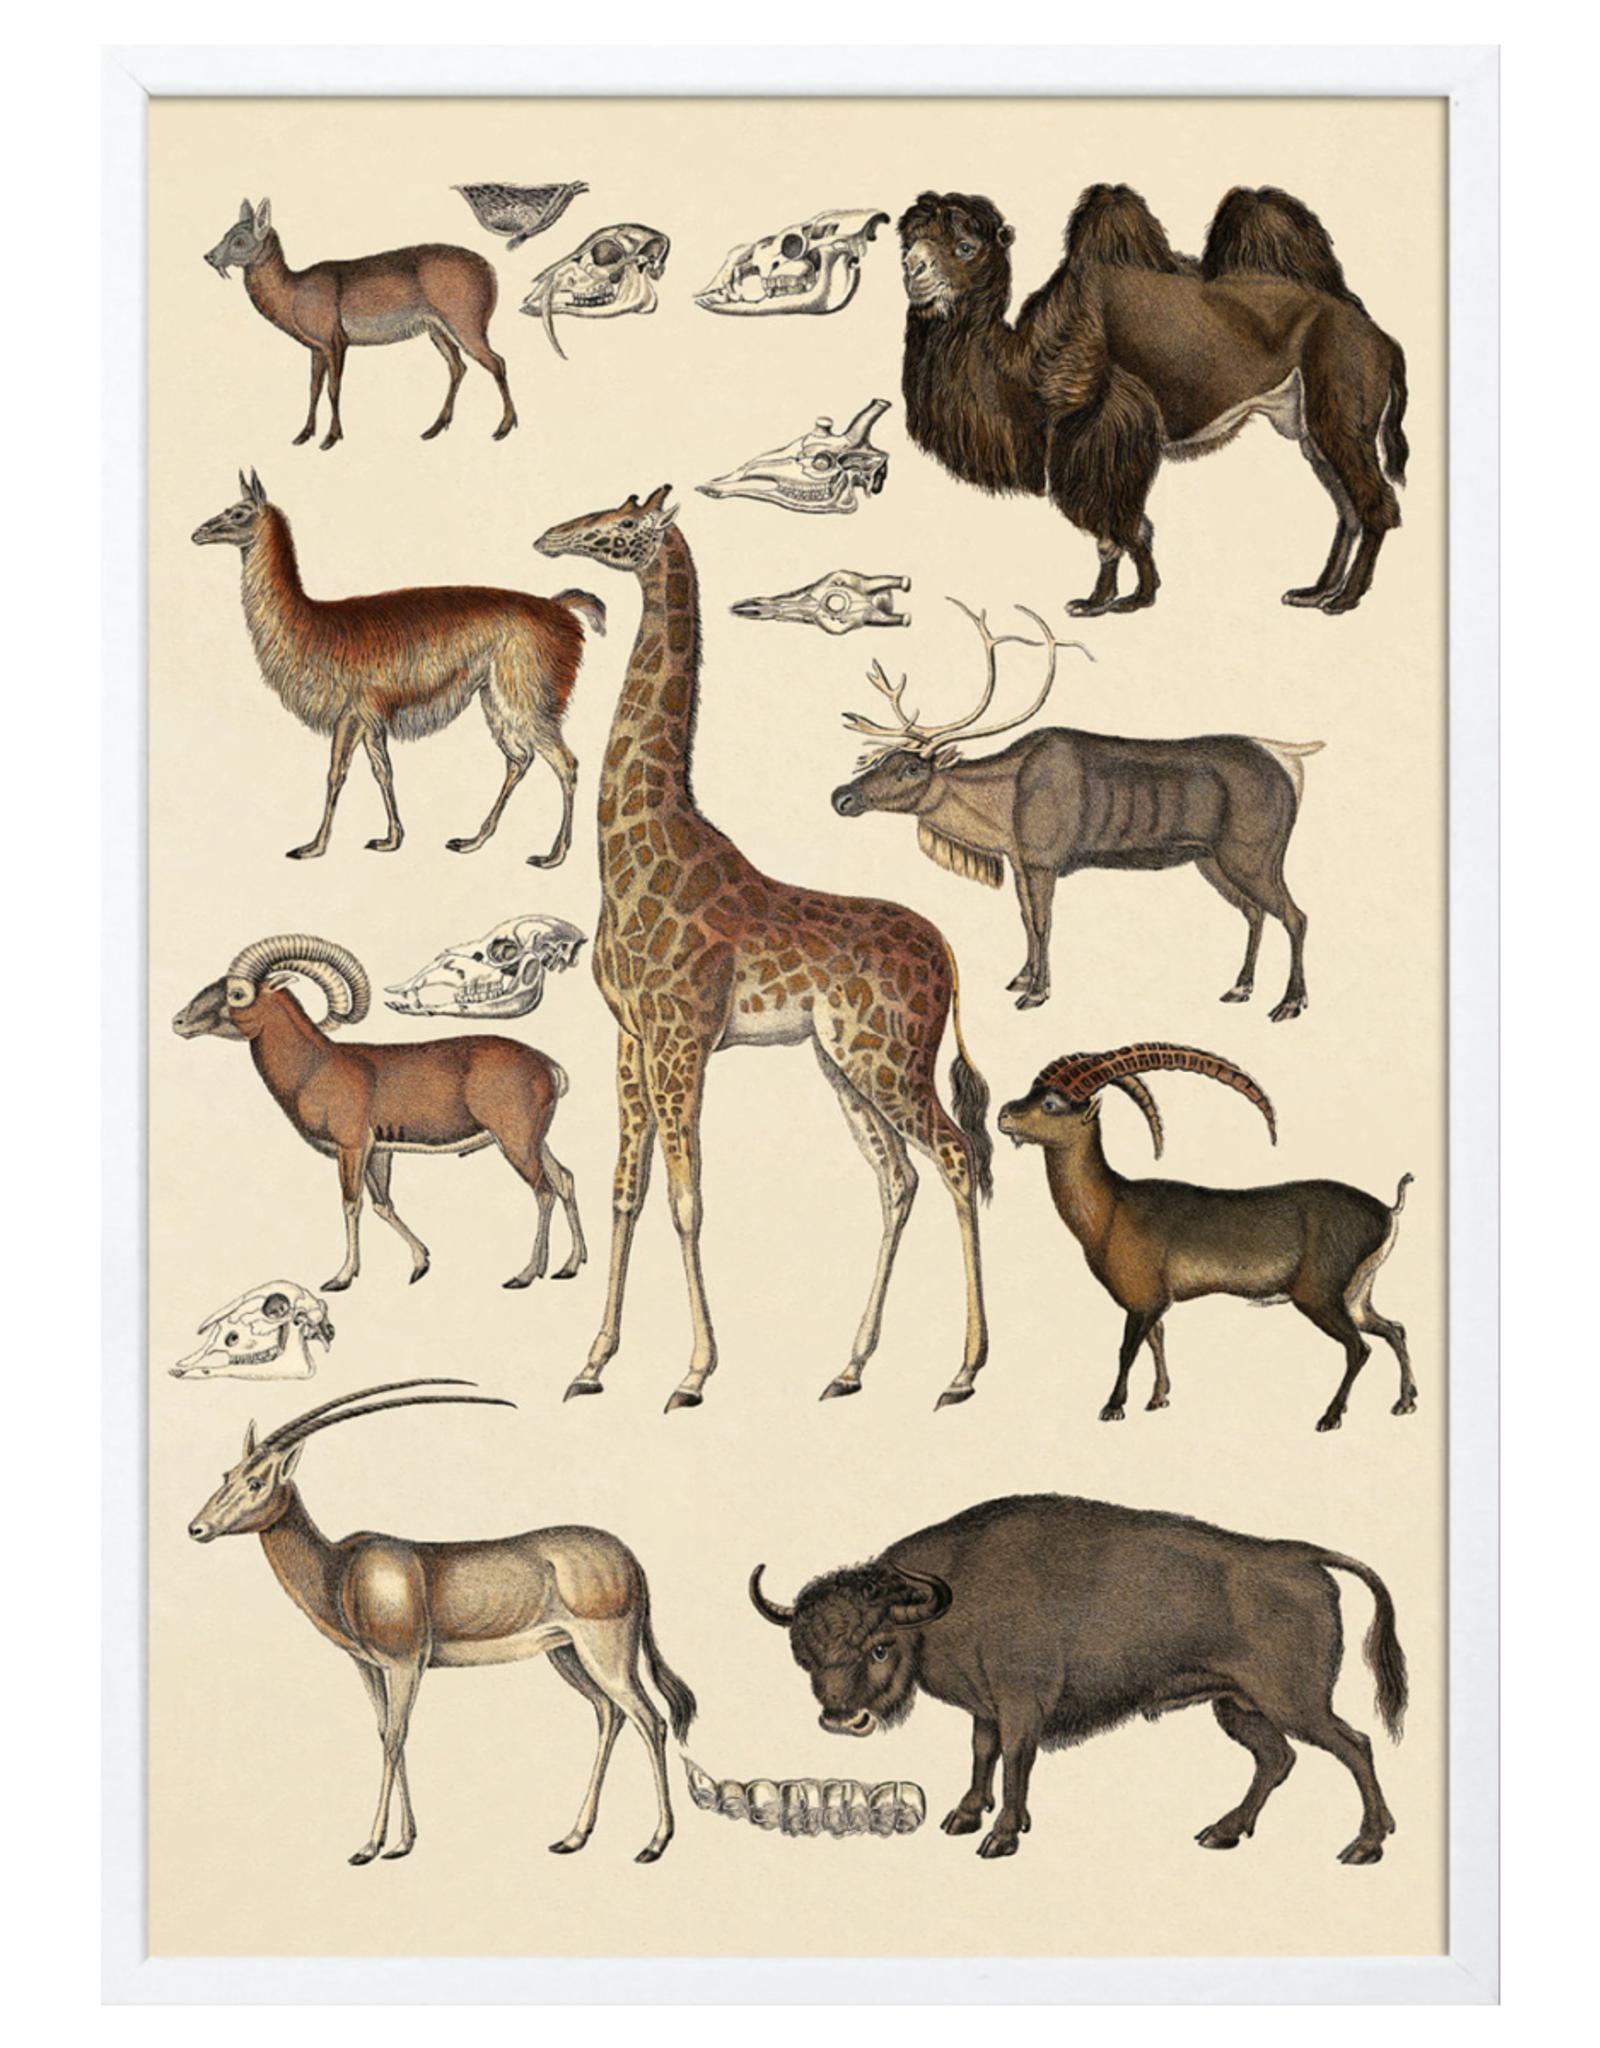 The Dybdahl & Co Animalia Giraf